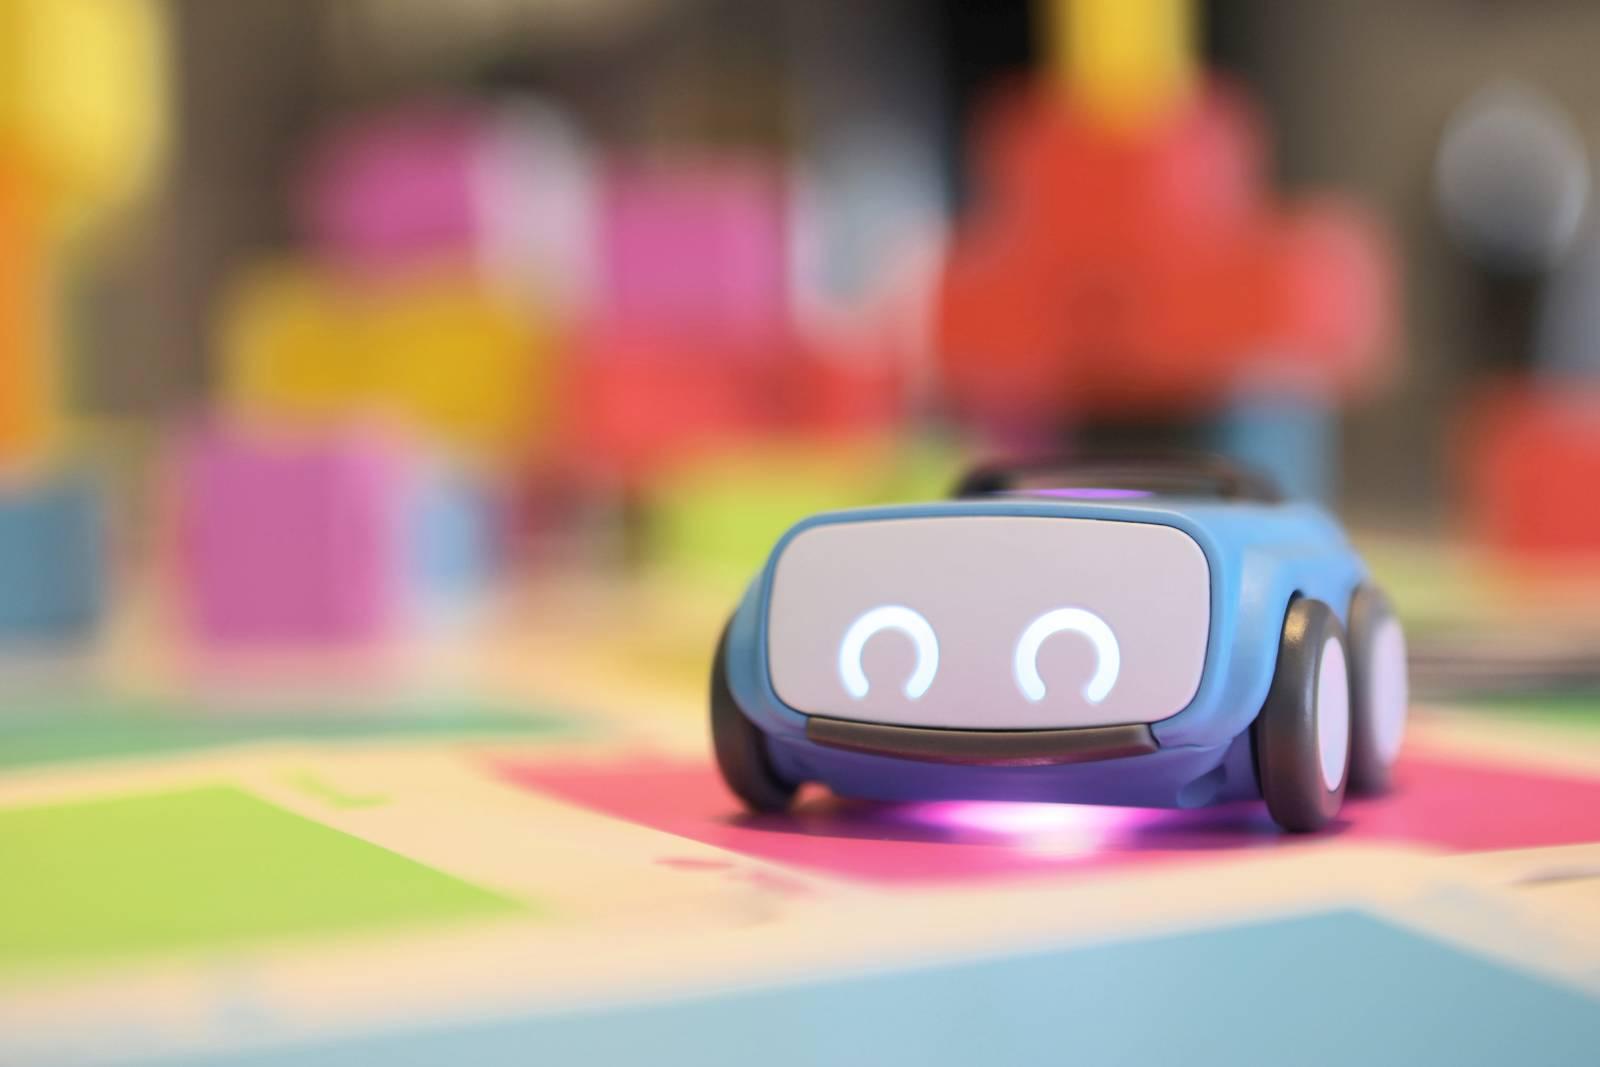 Встречайте indi, первого робота Sphero для детей младшего возраста